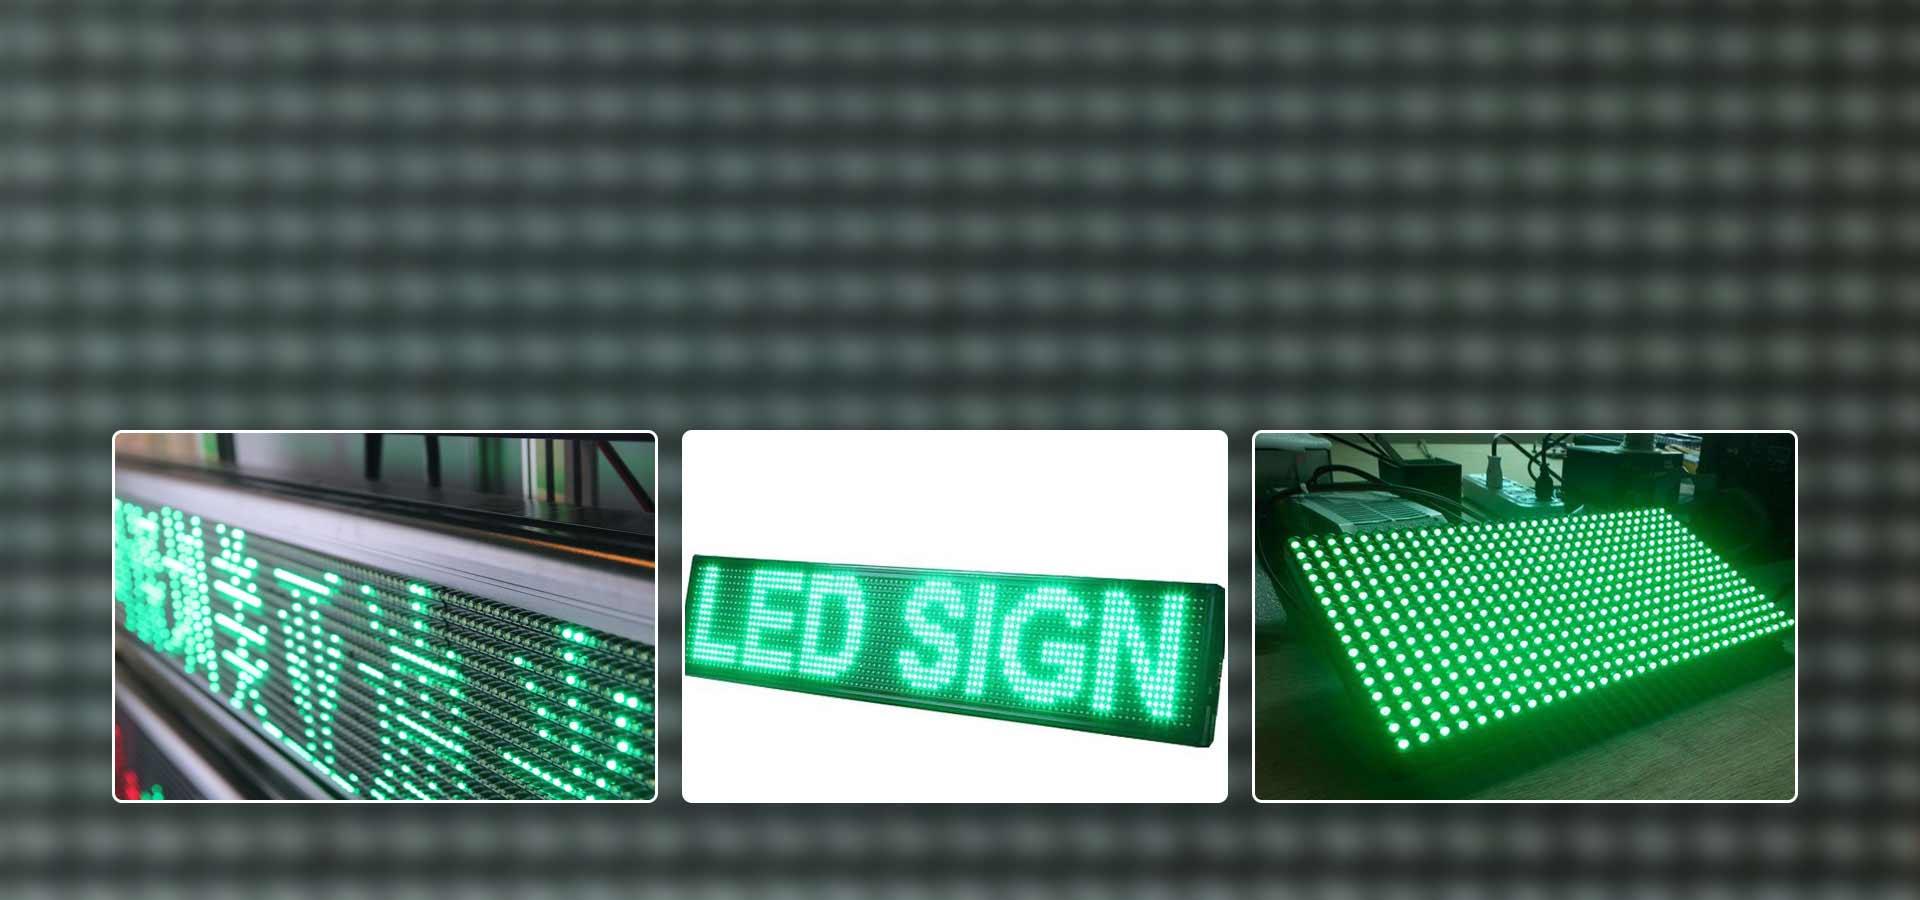 LED单色显示屏美亚迪展示